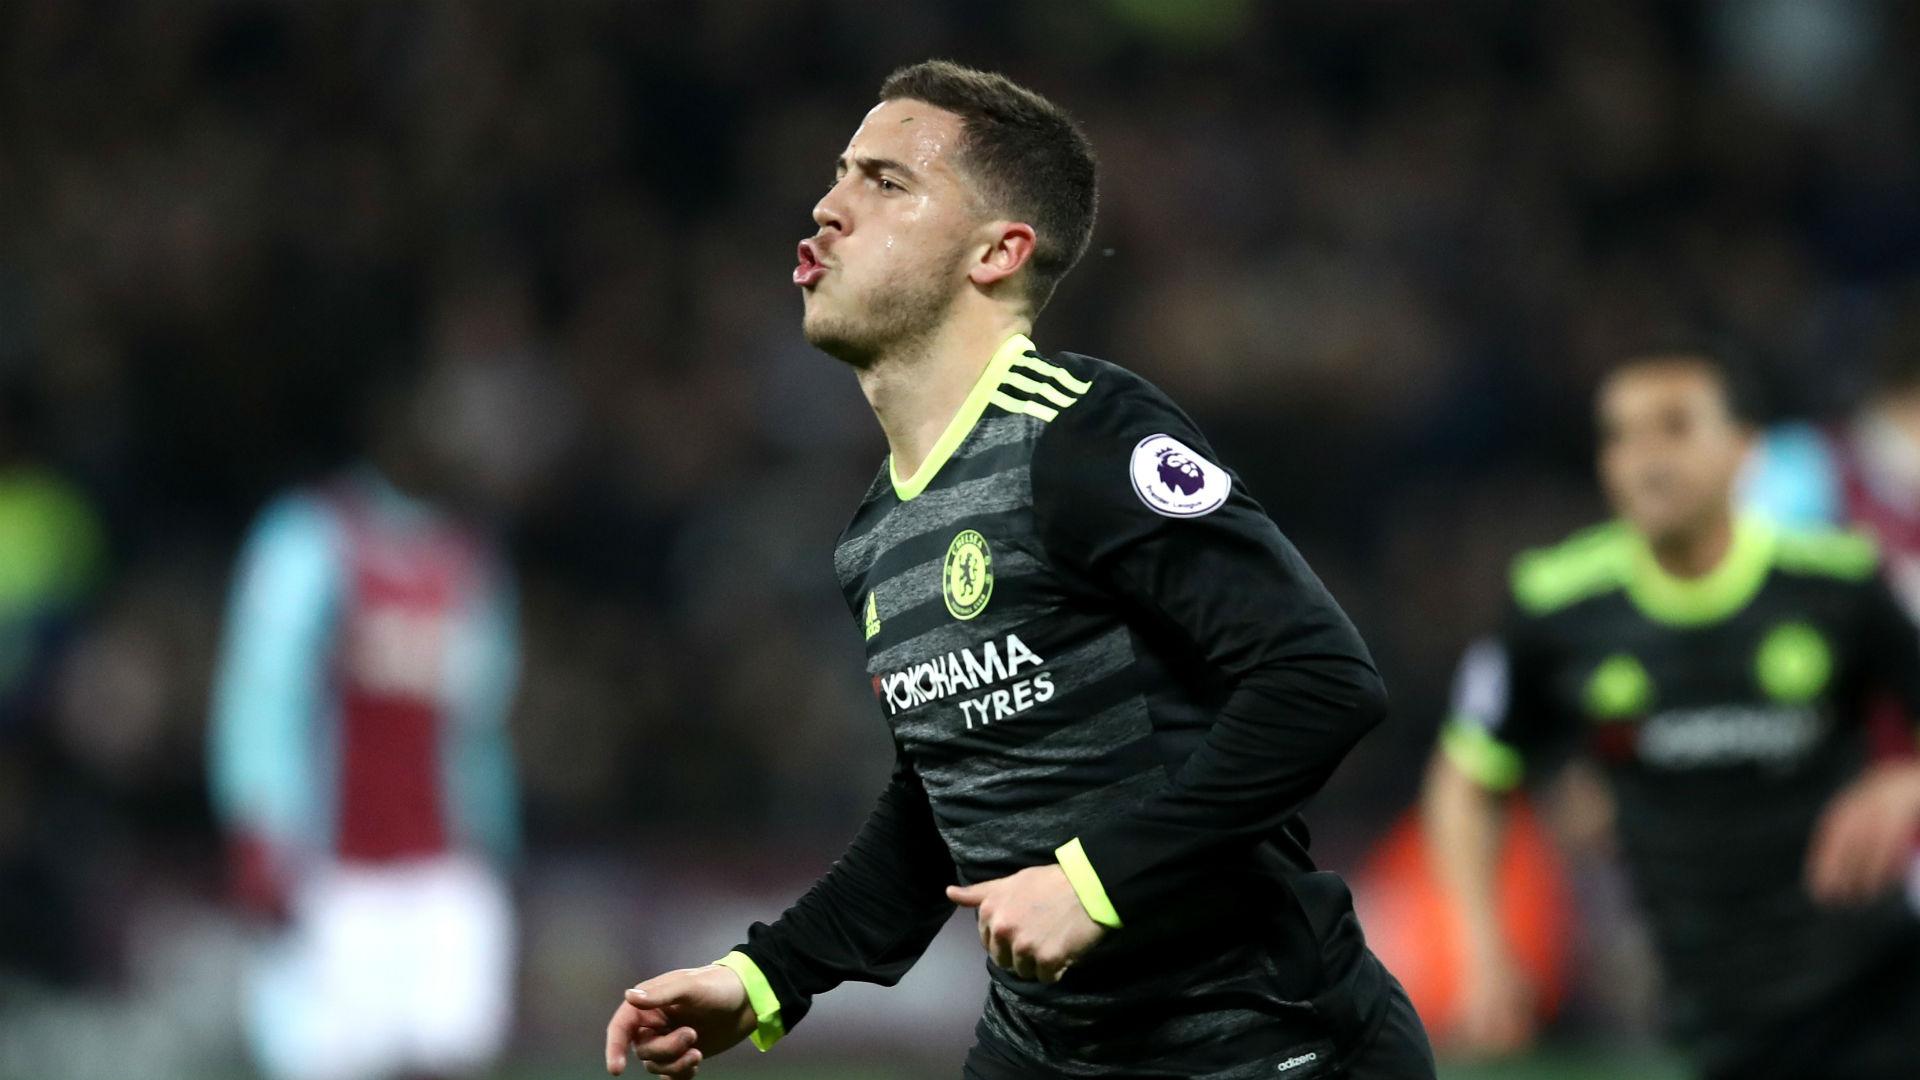 Chelsea West Ham Eden Hazard